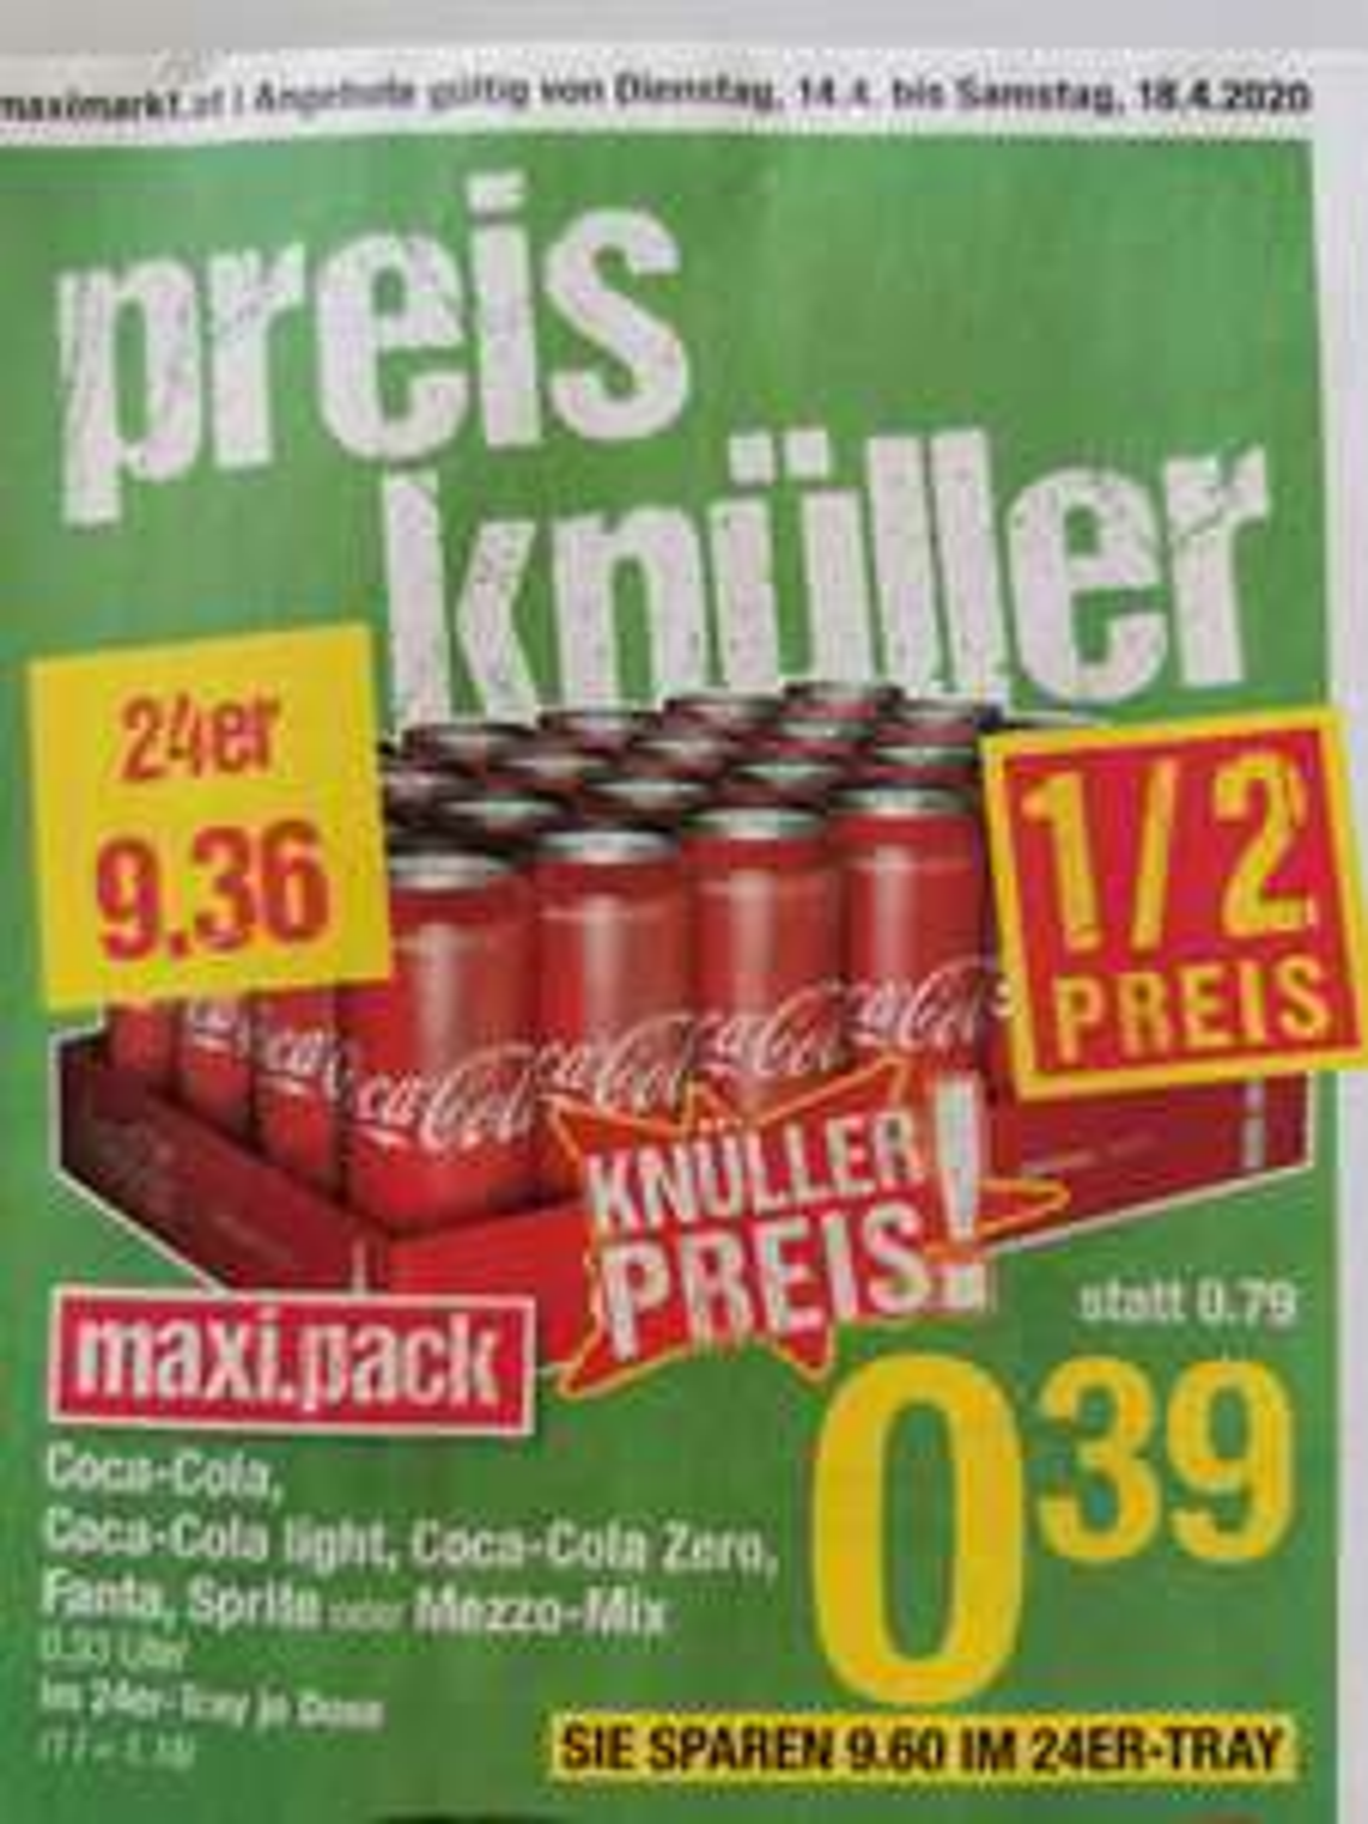 @maximarkt Coca Cola, light, zero, Fanta, Sprite, MezzoMix